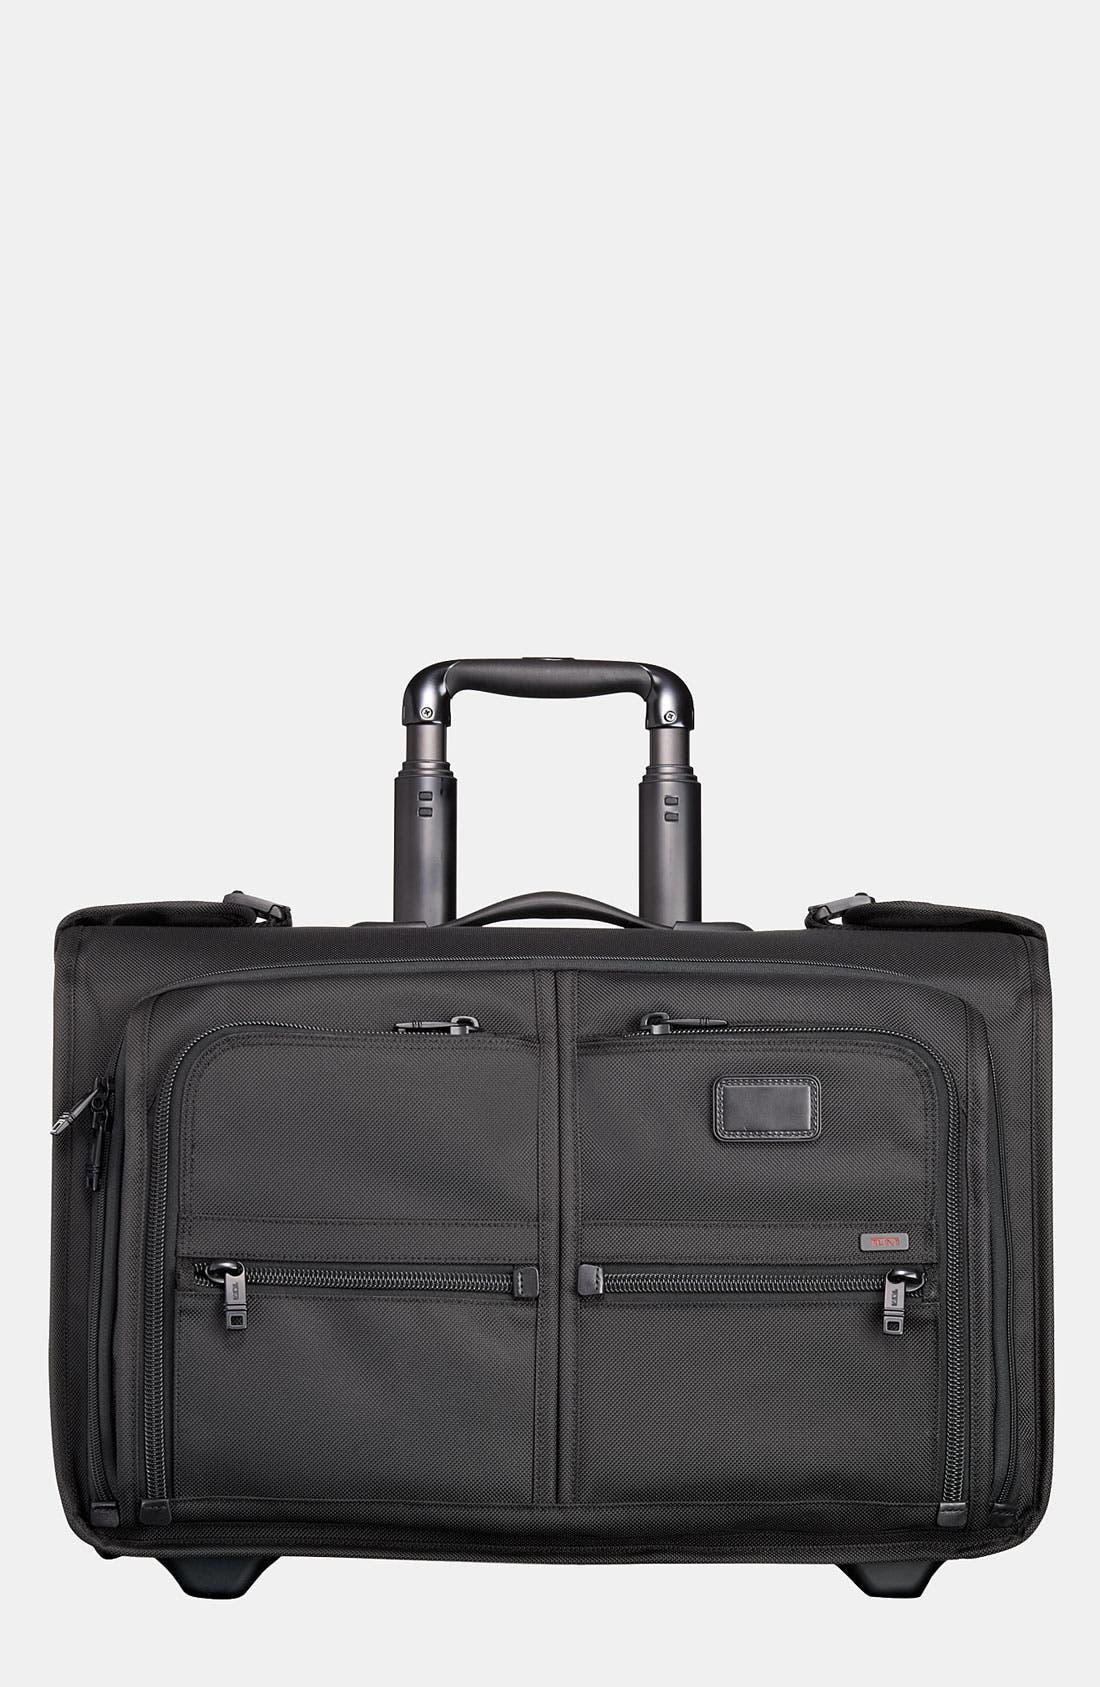 Alternate Image 1 Selected - Tumi 'Alpha' Wheeled Carry-On Garment Bag